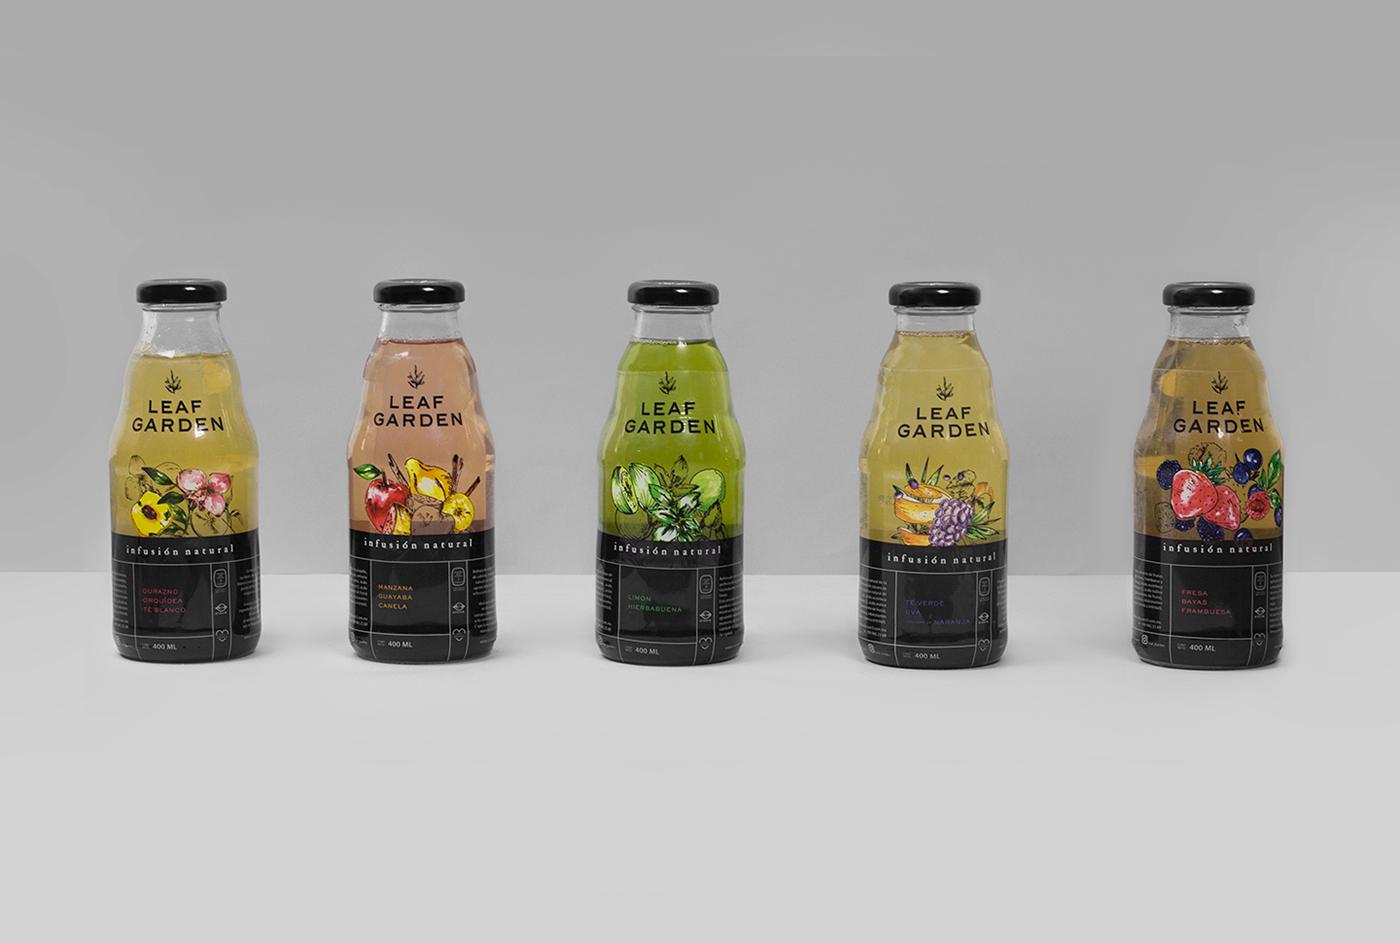 0f8ad148123247.588f864b3a2c2 - La boisson qui promet l'immortalité - Leaf Garden